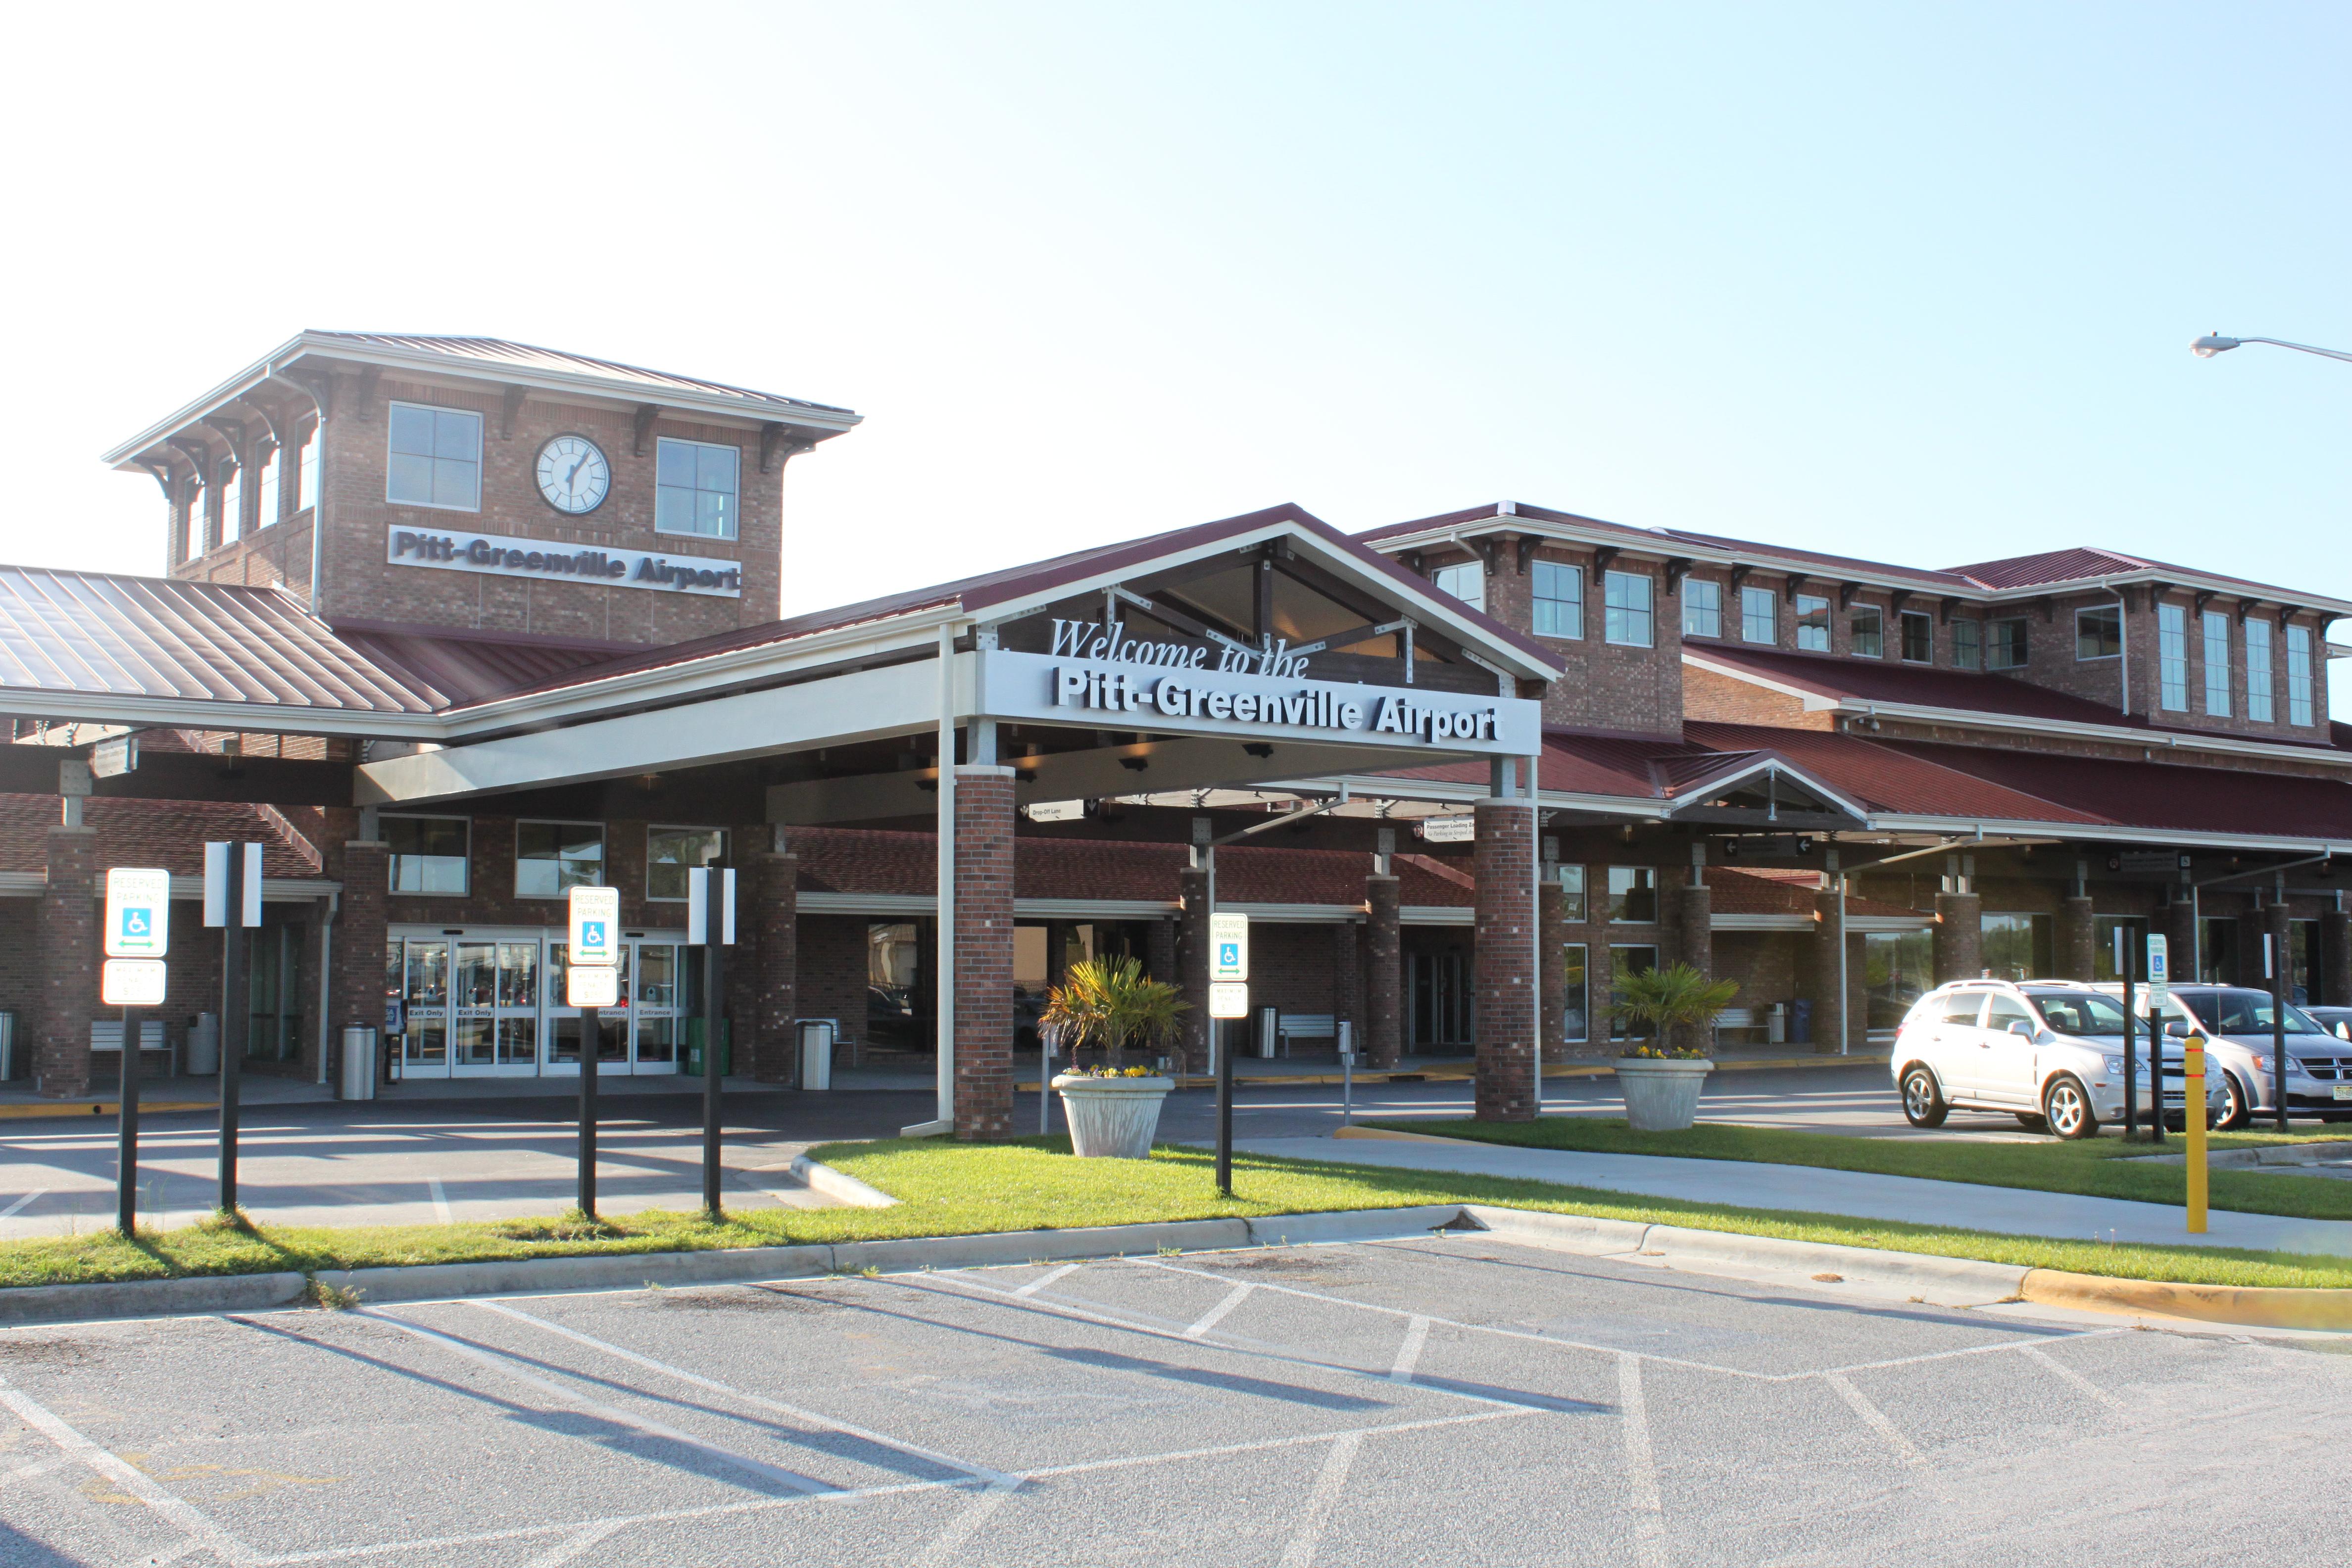 File Pitt Greenville Airport Greenville NC JPG Wikimedia mons